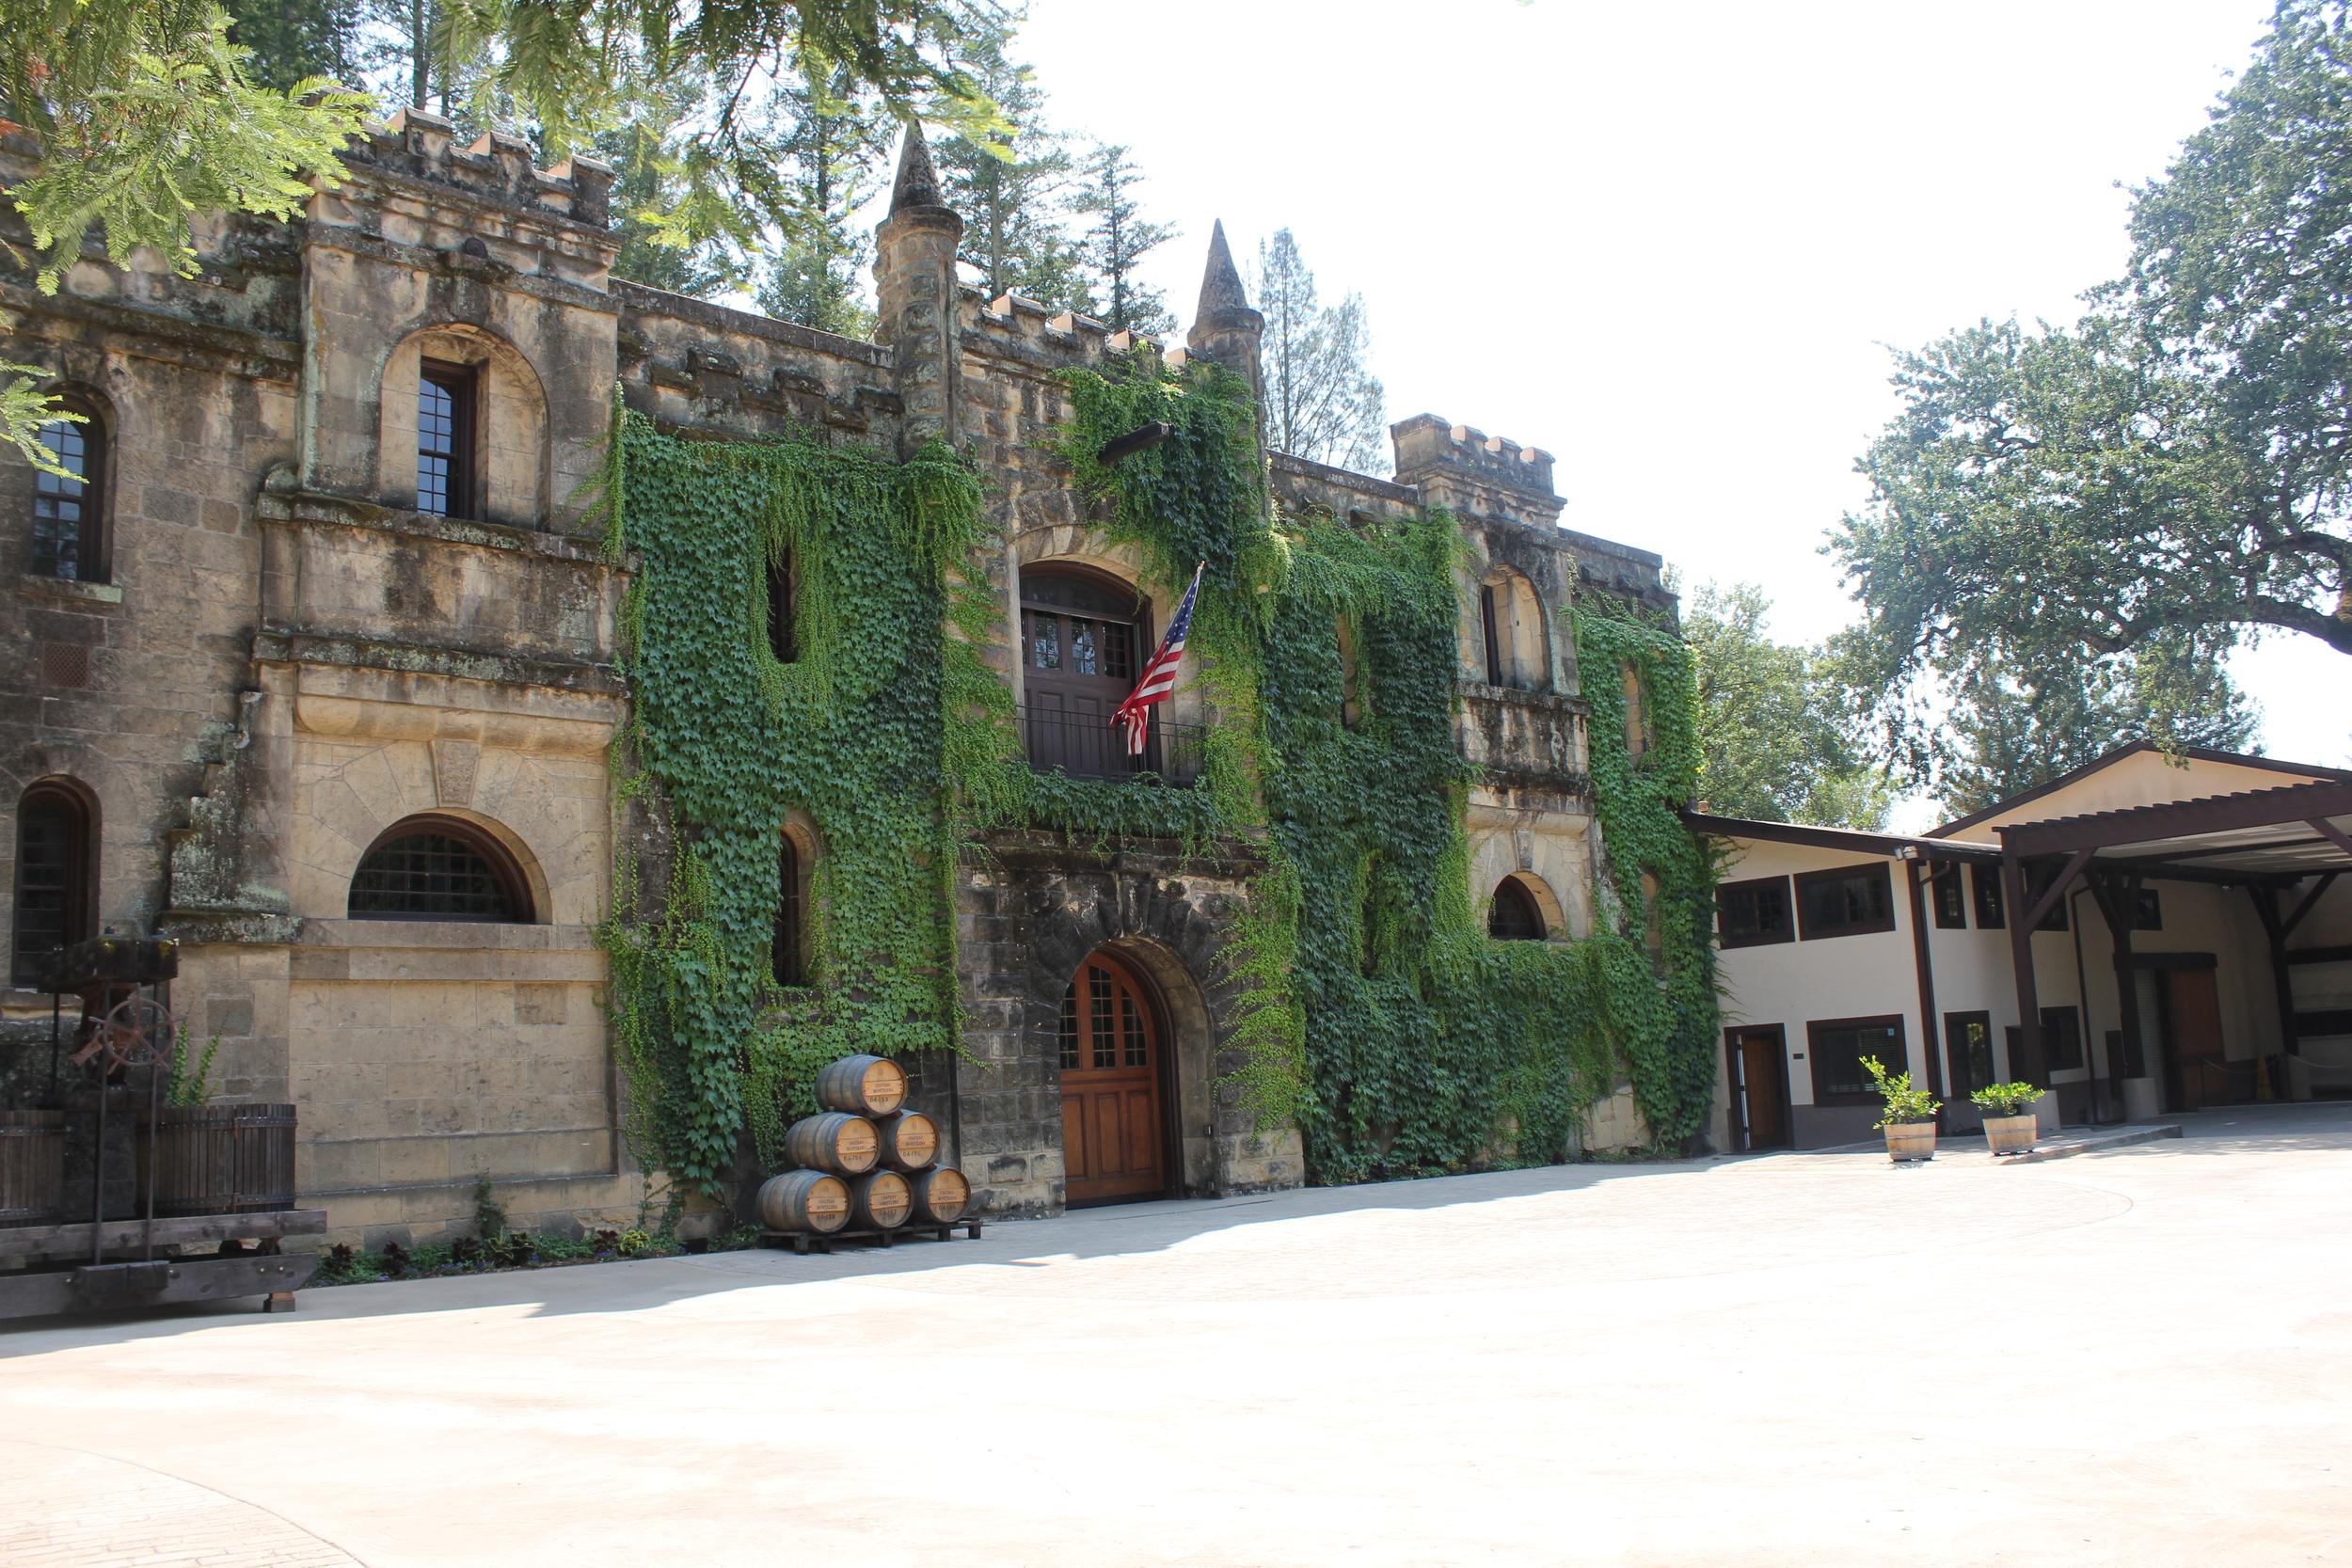 Beautiful Chateau Montelena in Calistoga, CA